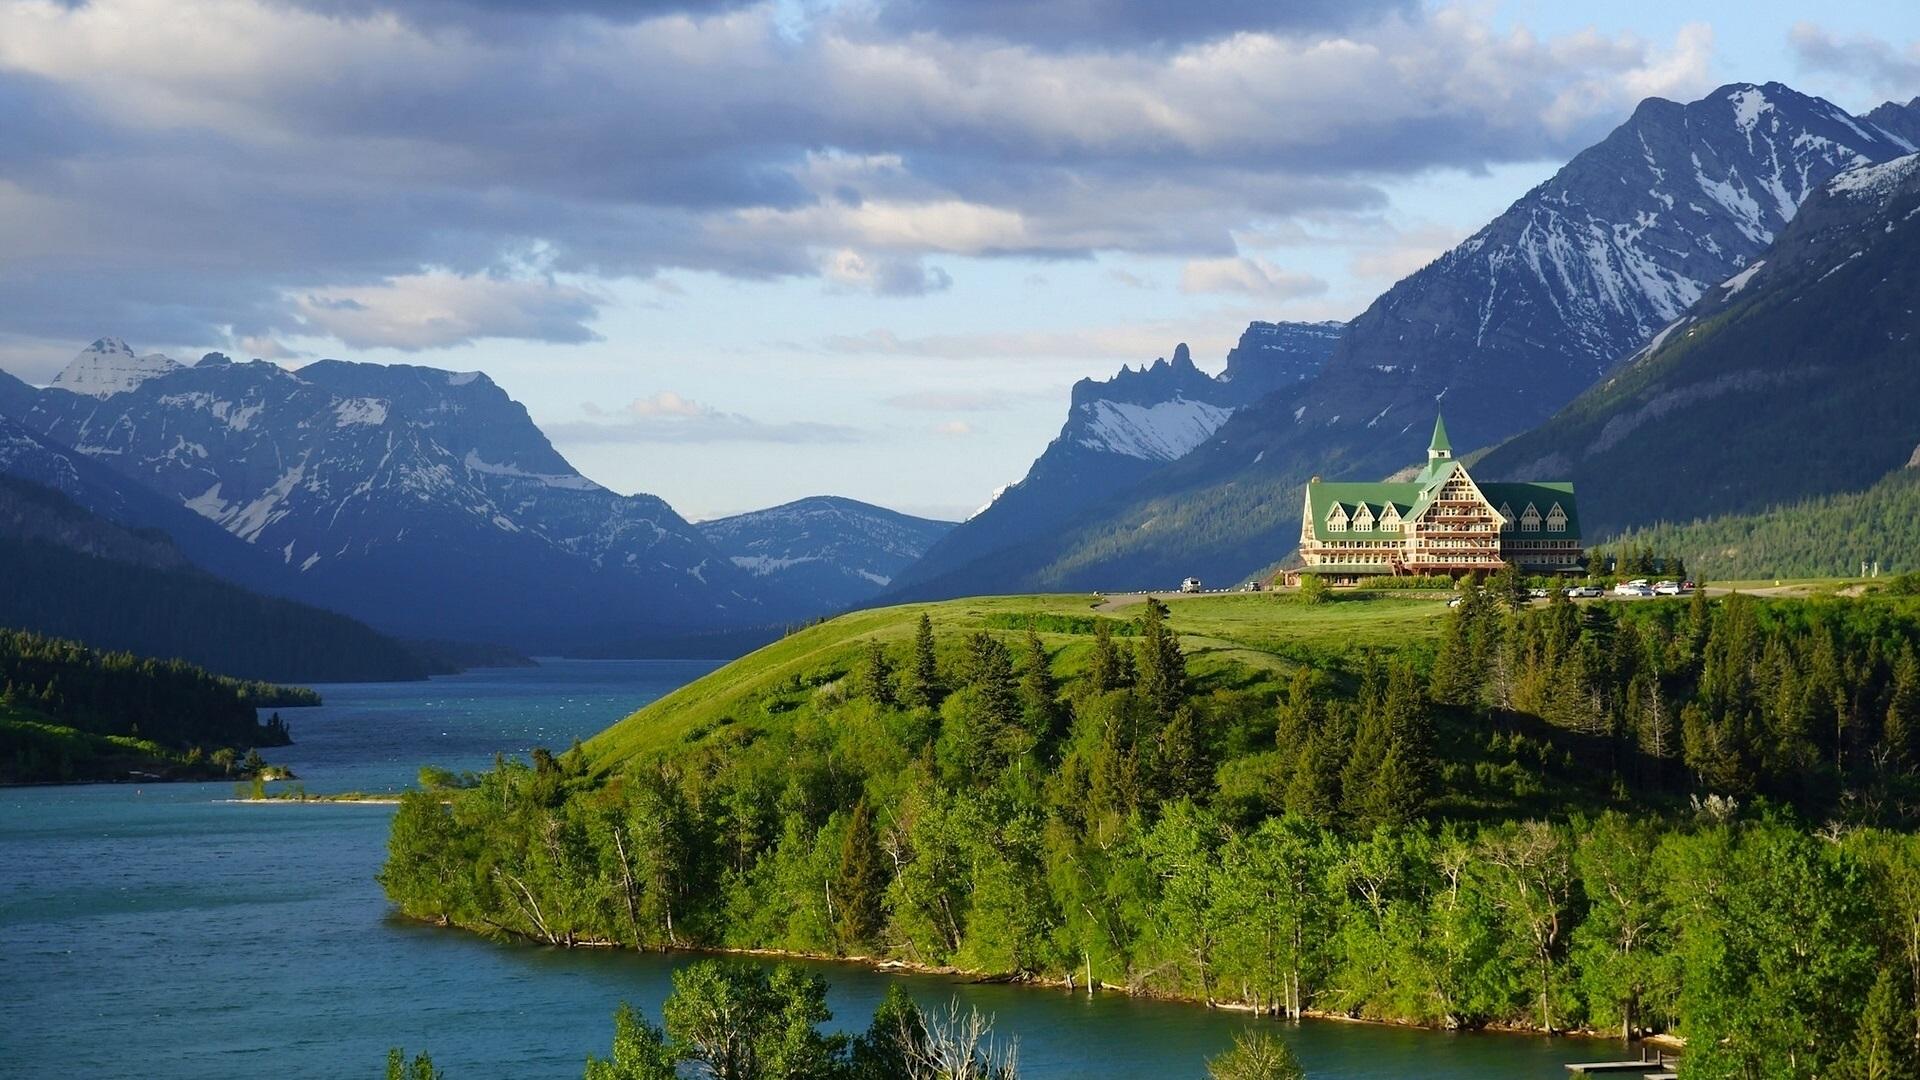 Wallpaper Prince Of Wales Hotel Waterton Lake Alberta